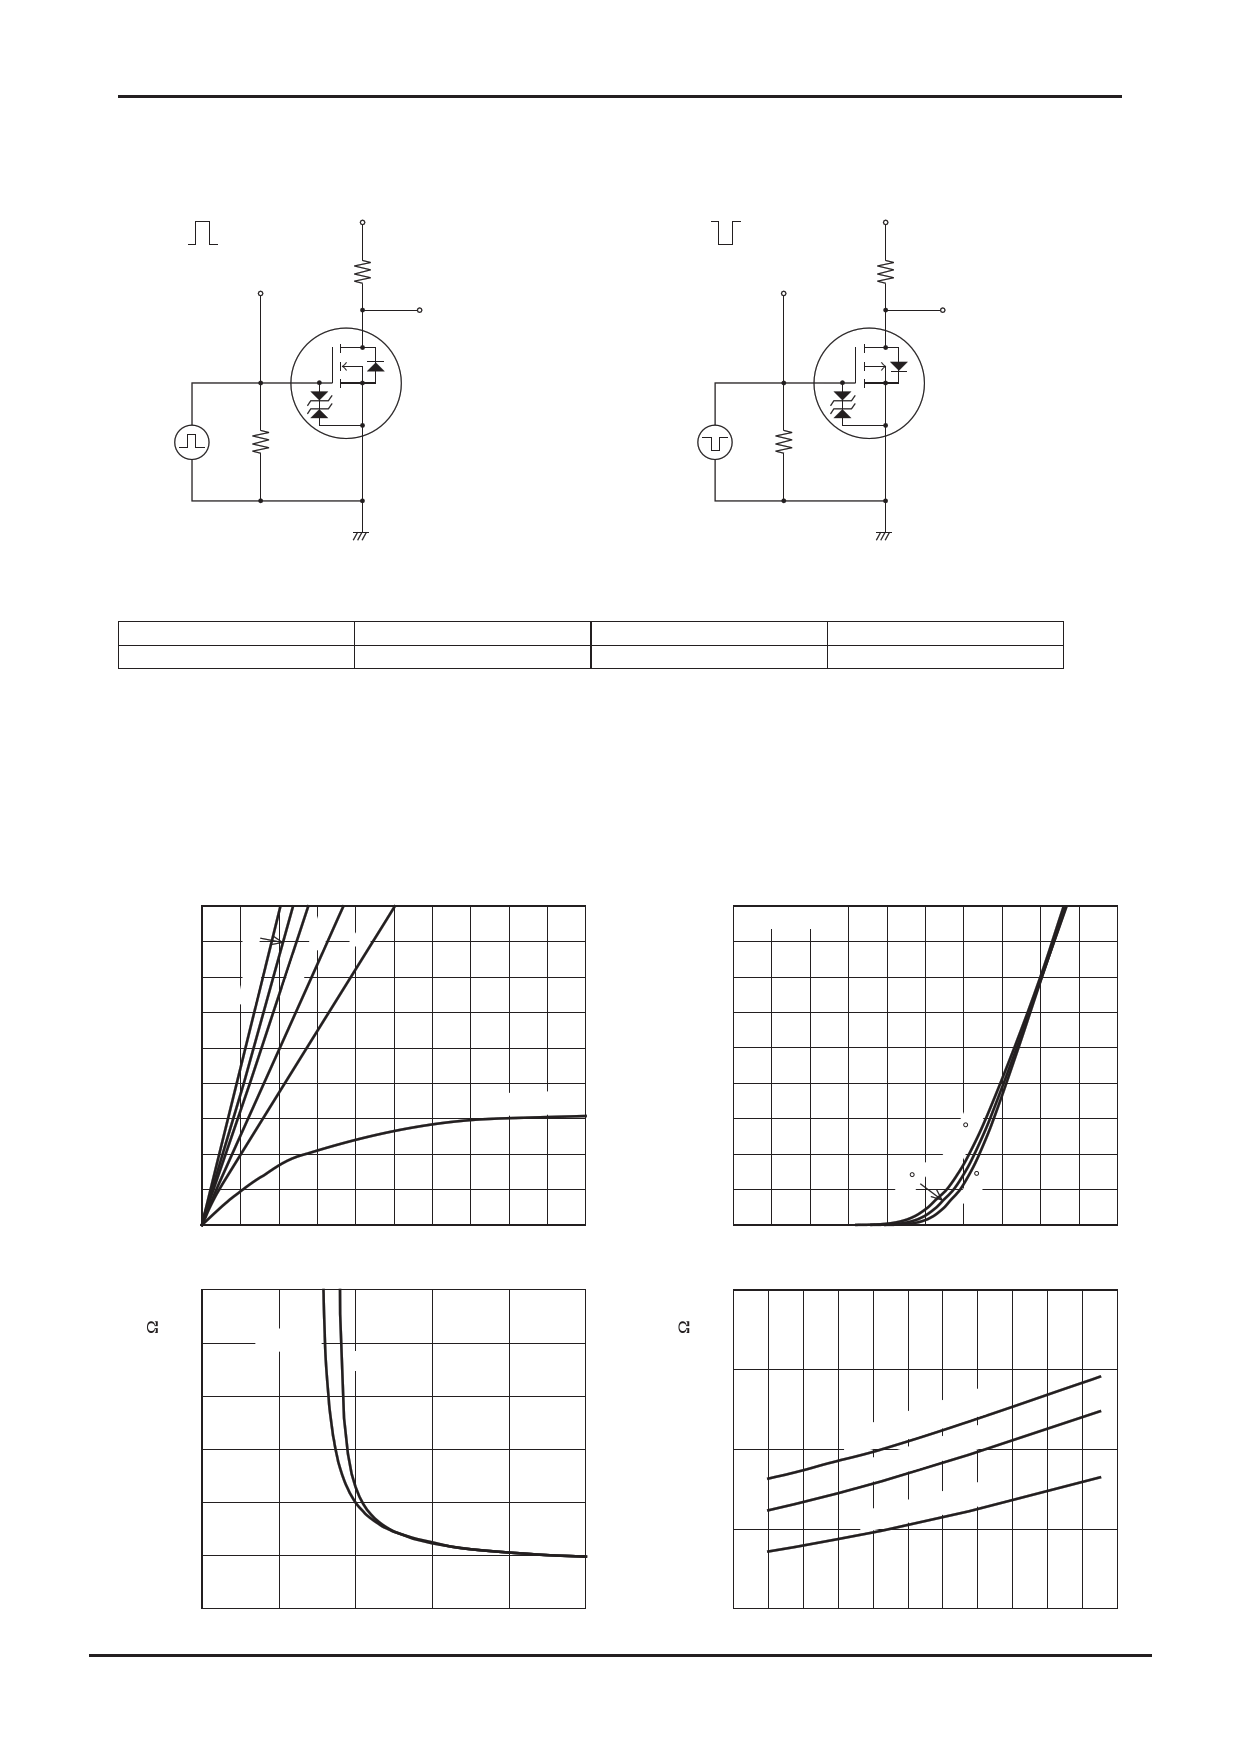 FW344A pdf, ピン配列